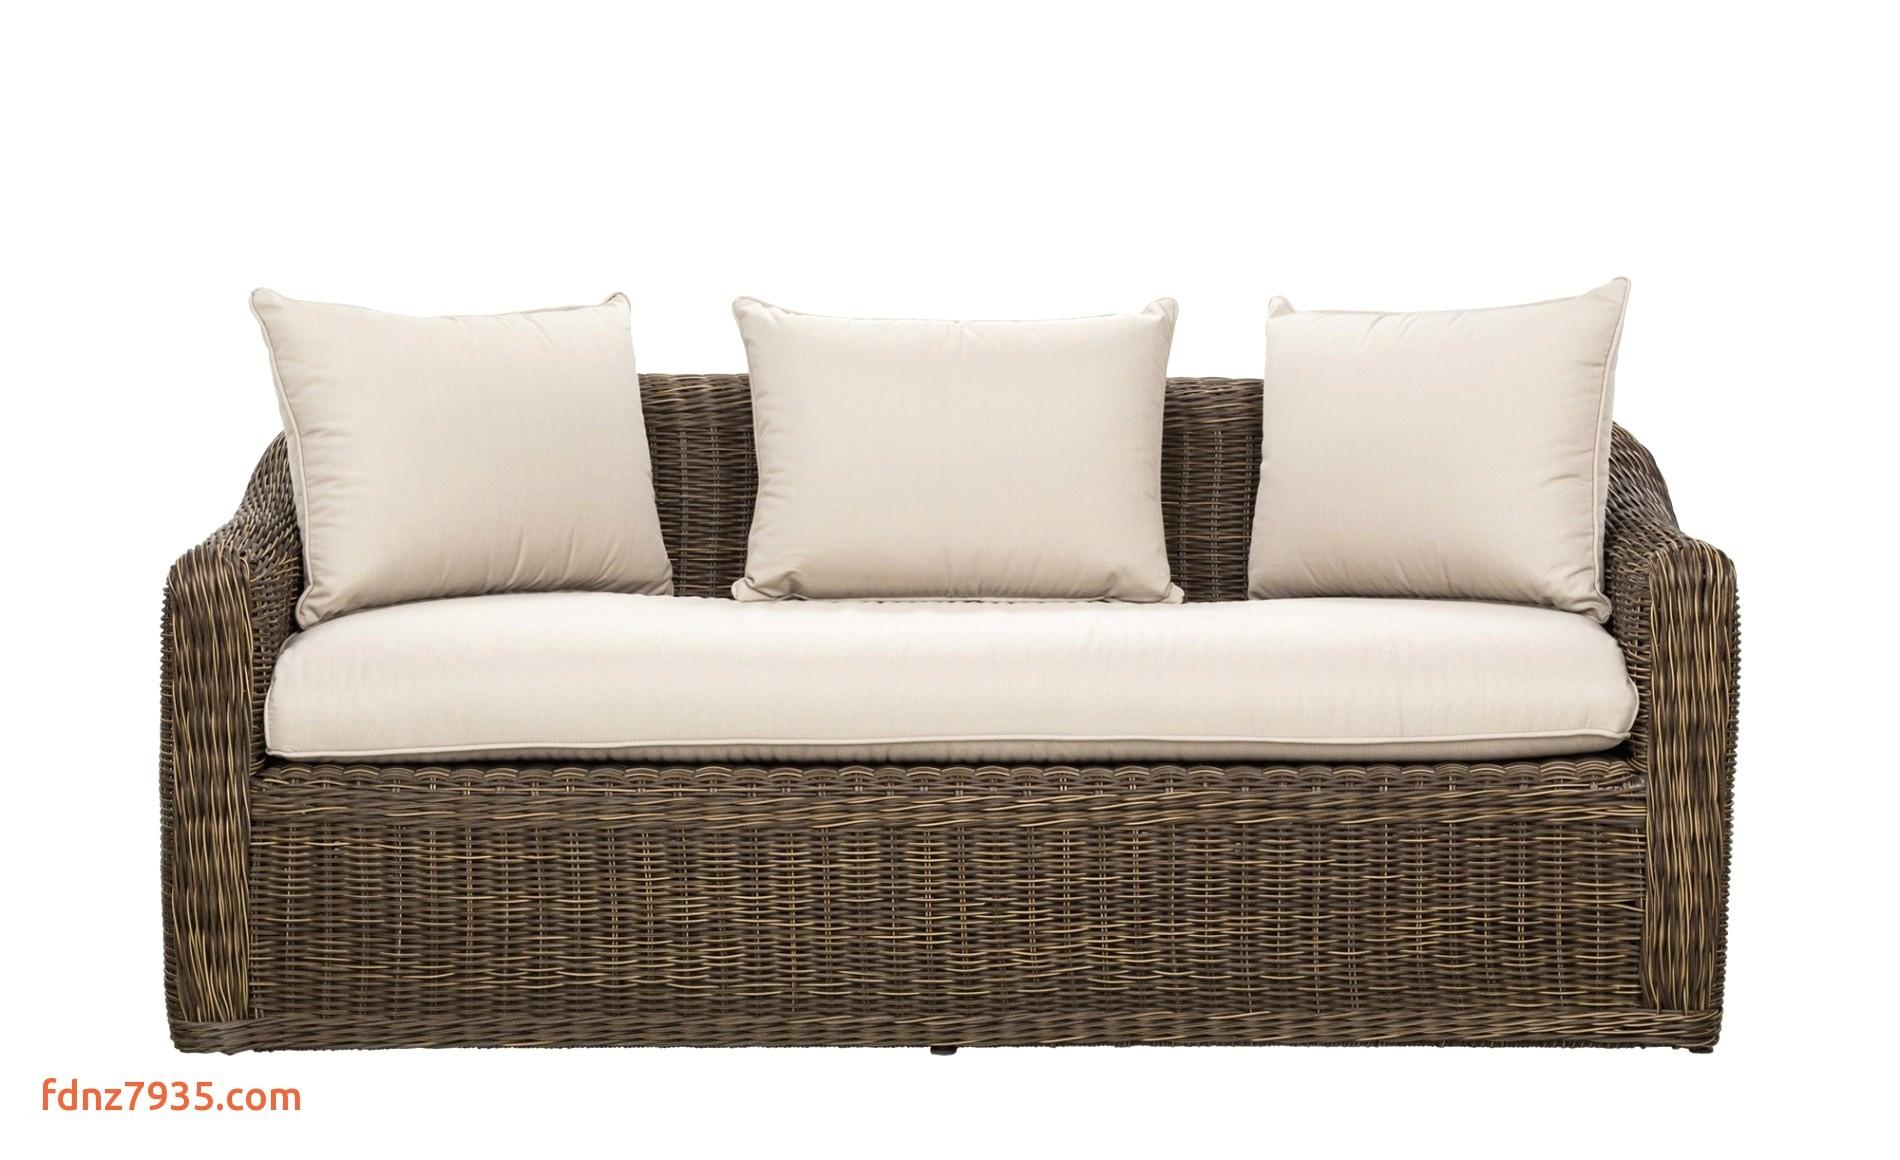 reclining patio chair cool patio recliner lounge chair fresh luxurios wicker outdoor sofa 0d